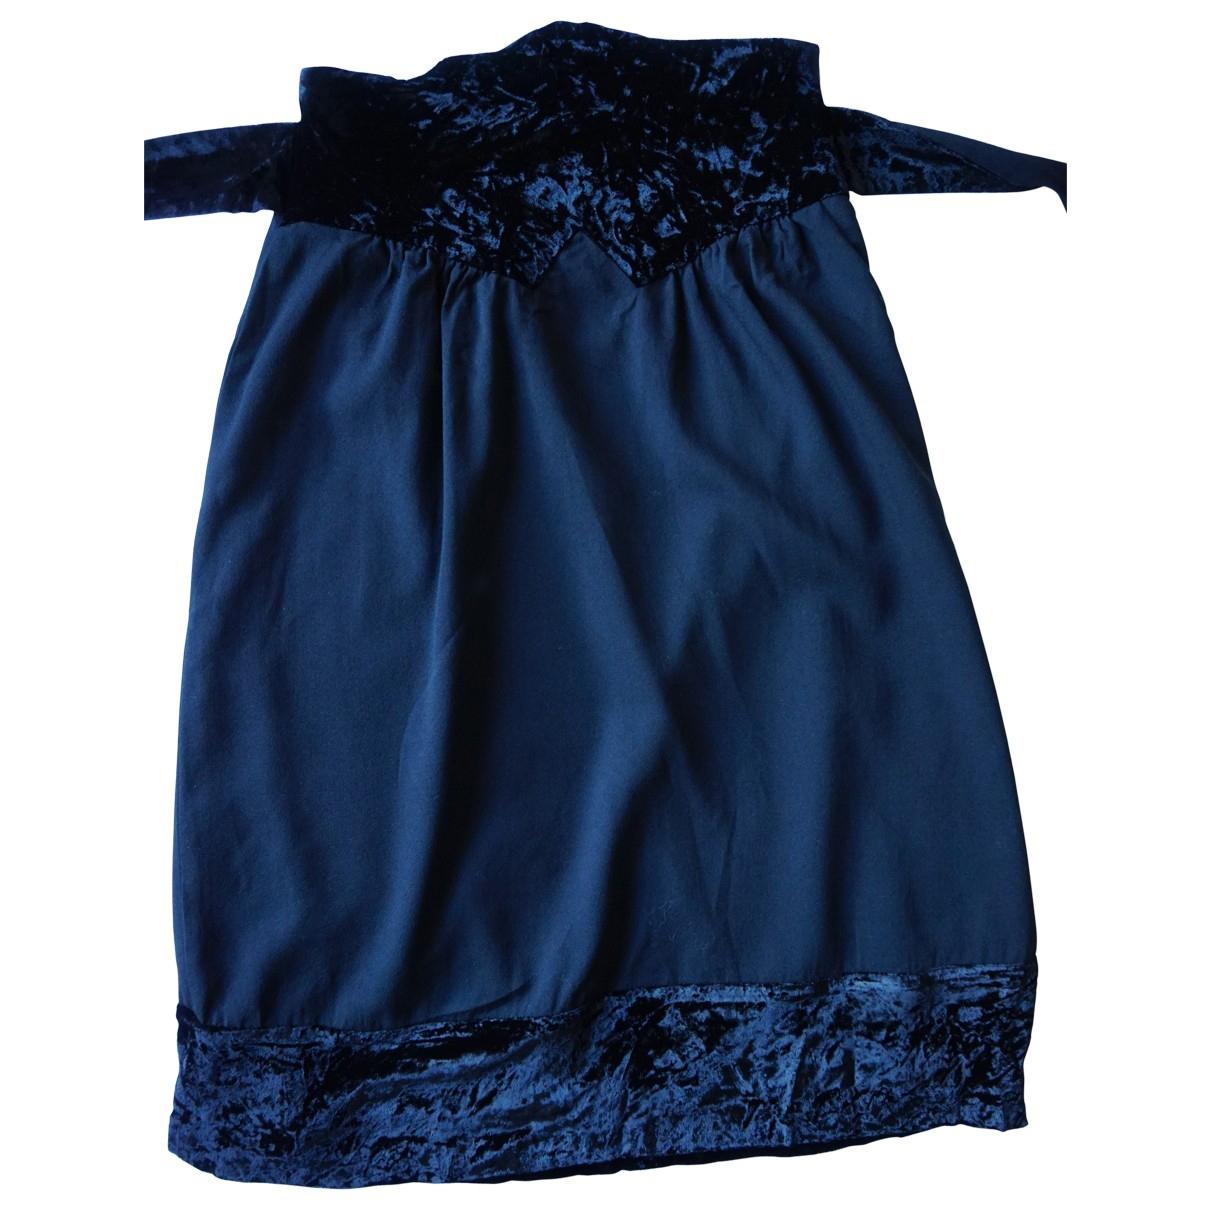 Azzaro - Jupe   pour femme en velours - noir